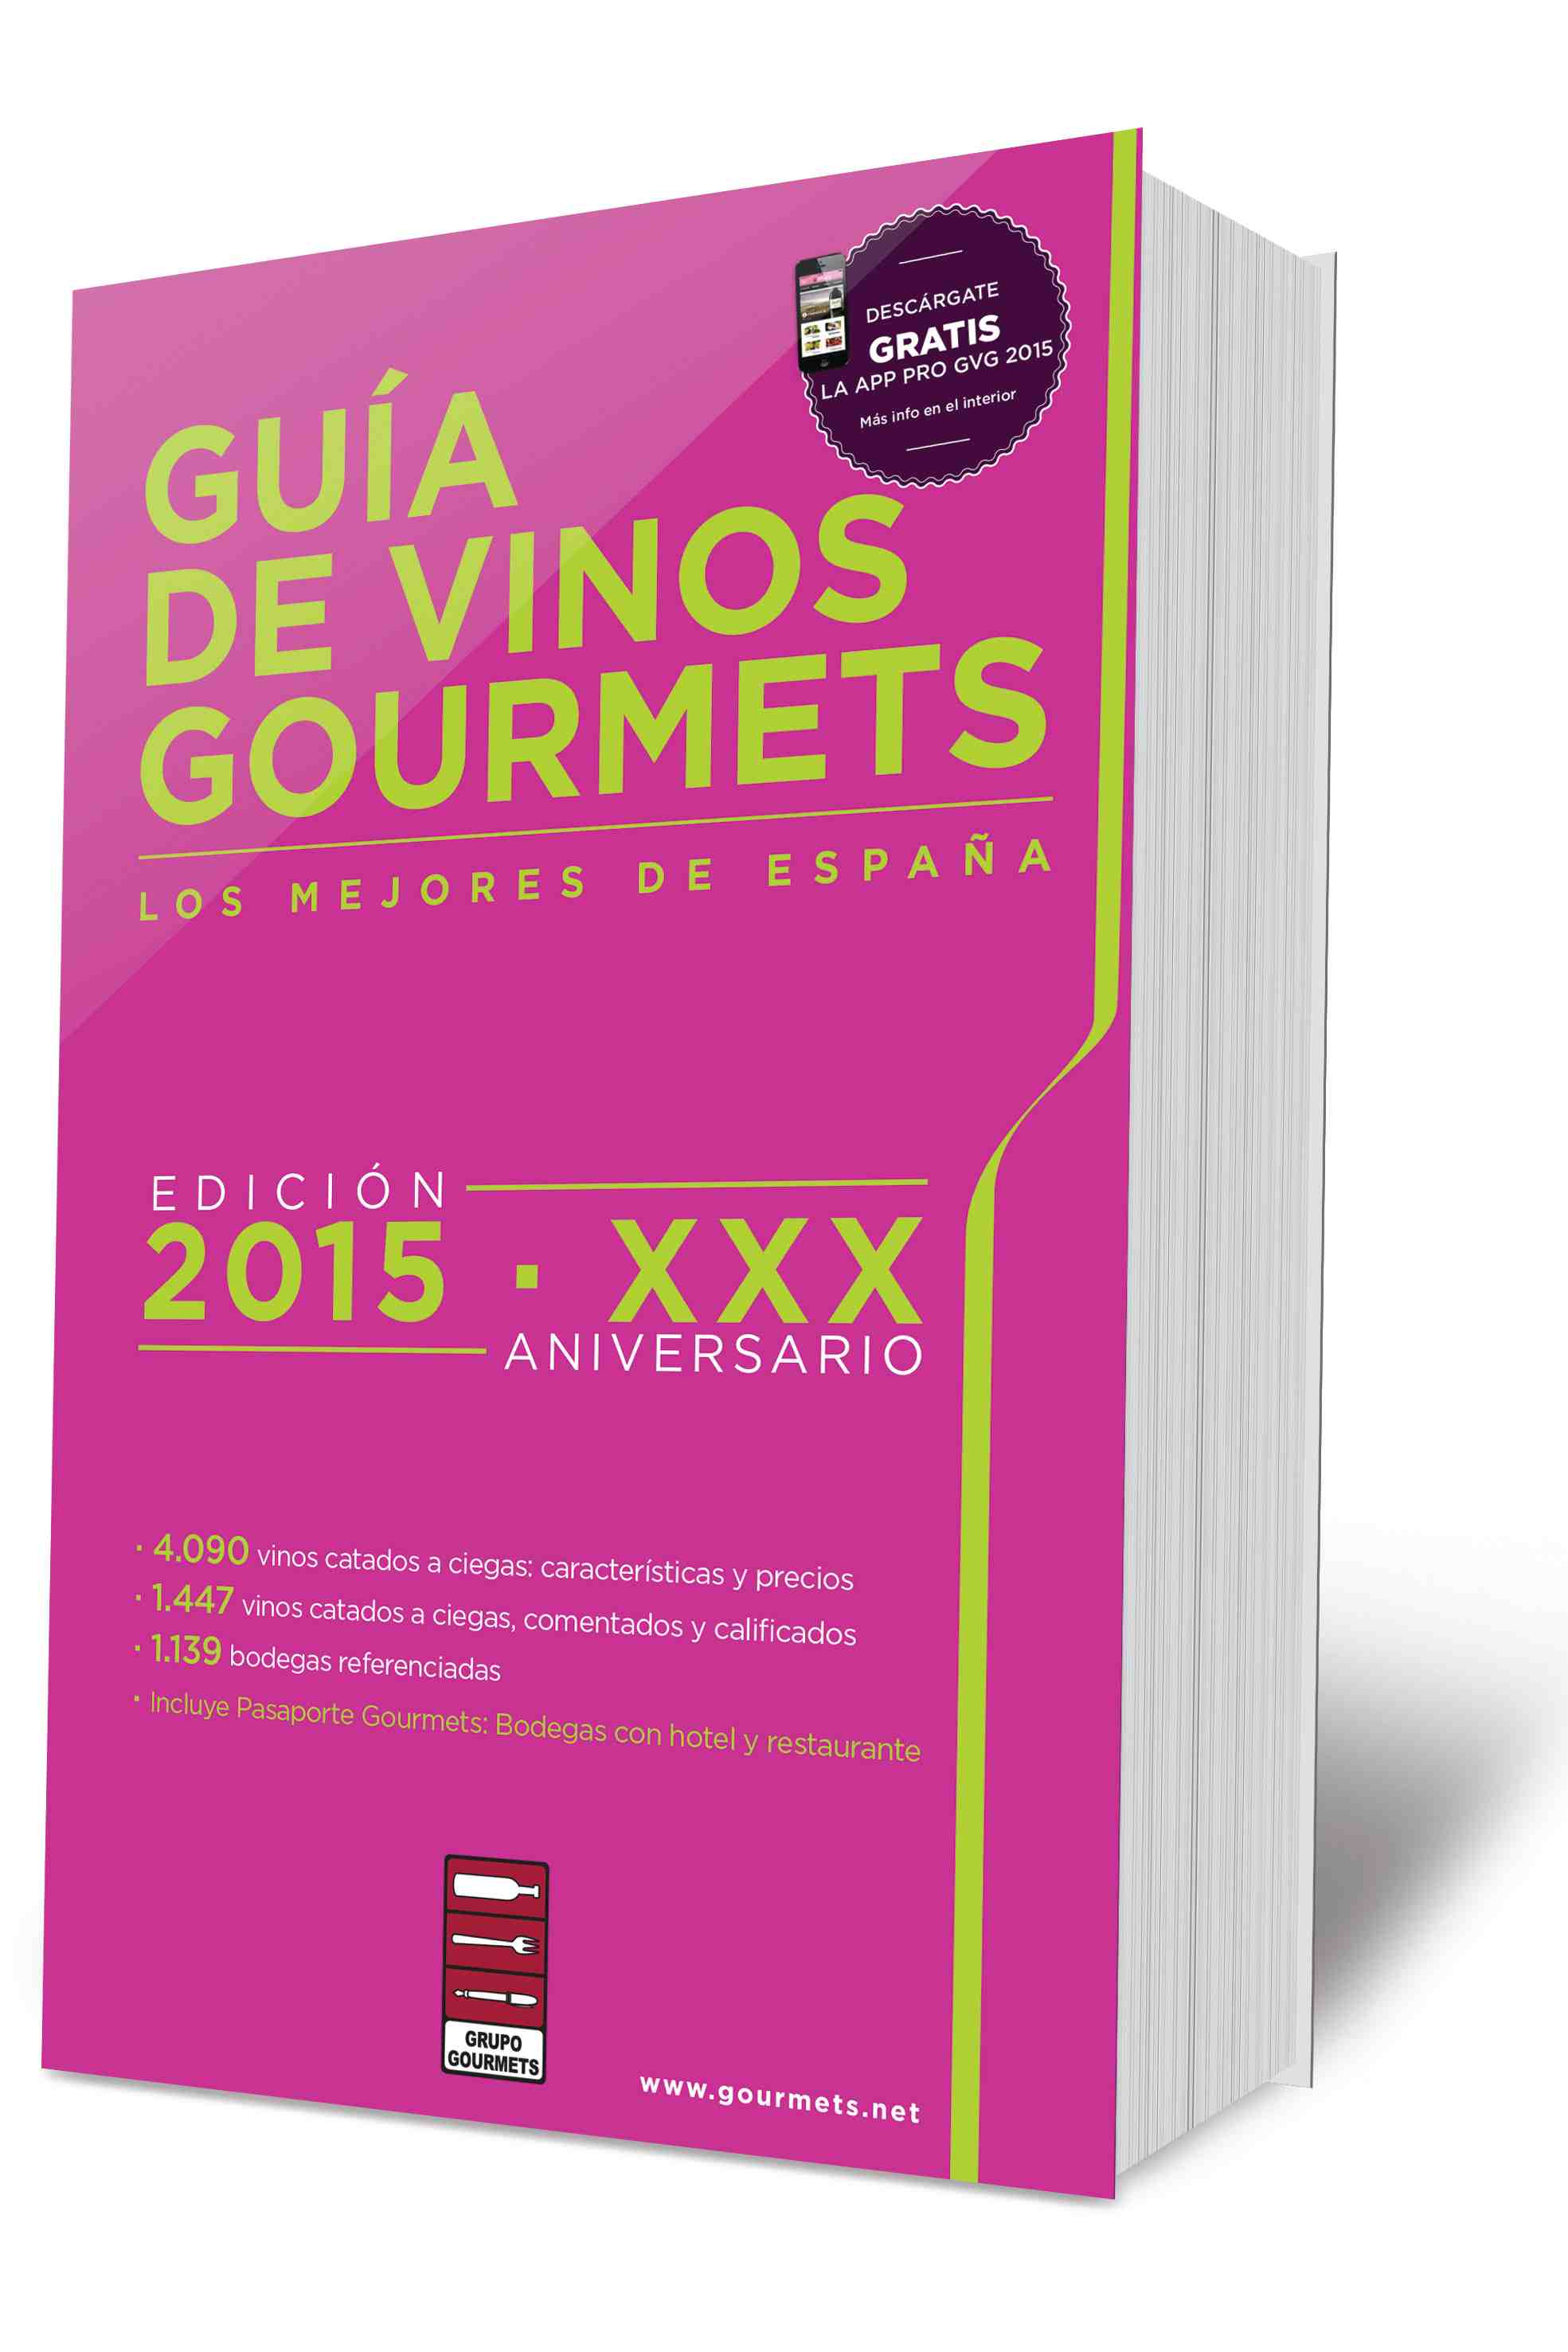 guia-de-vinos-gourmet-2015